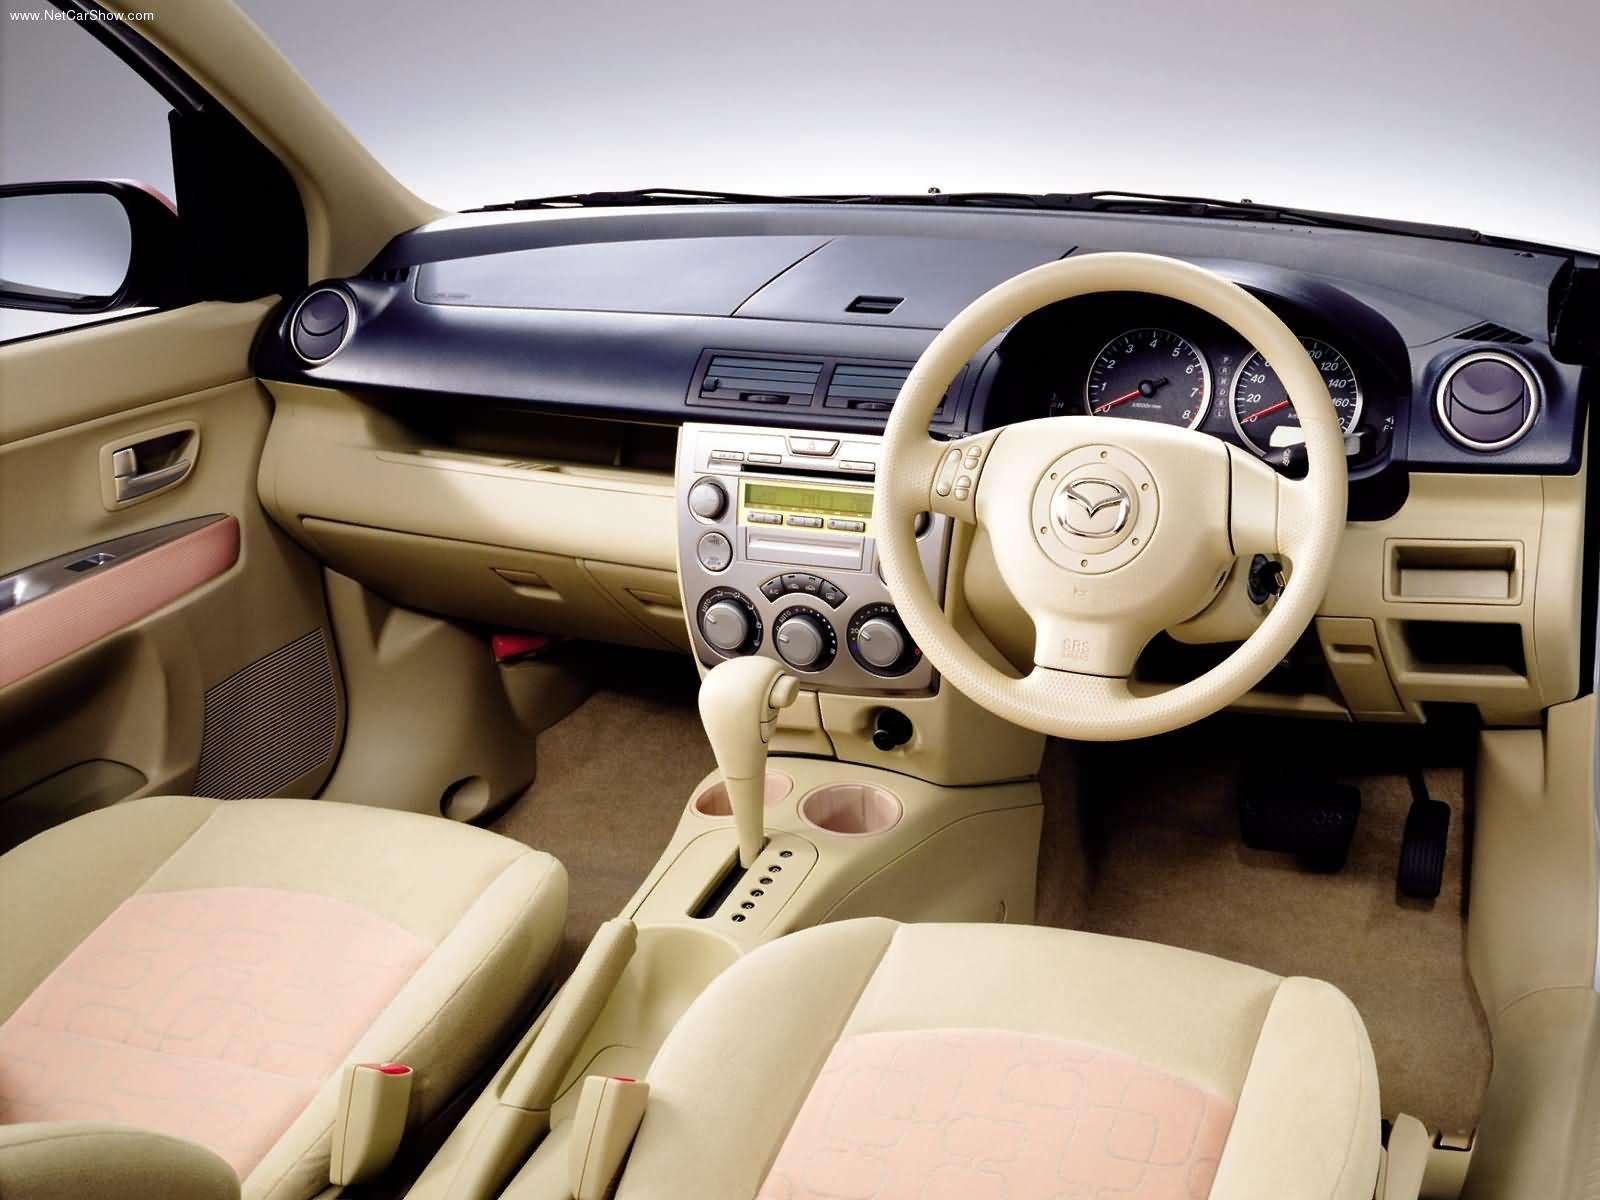 Mazda Demio photos - PhotoGallery with 13 pics| CarsBase.com